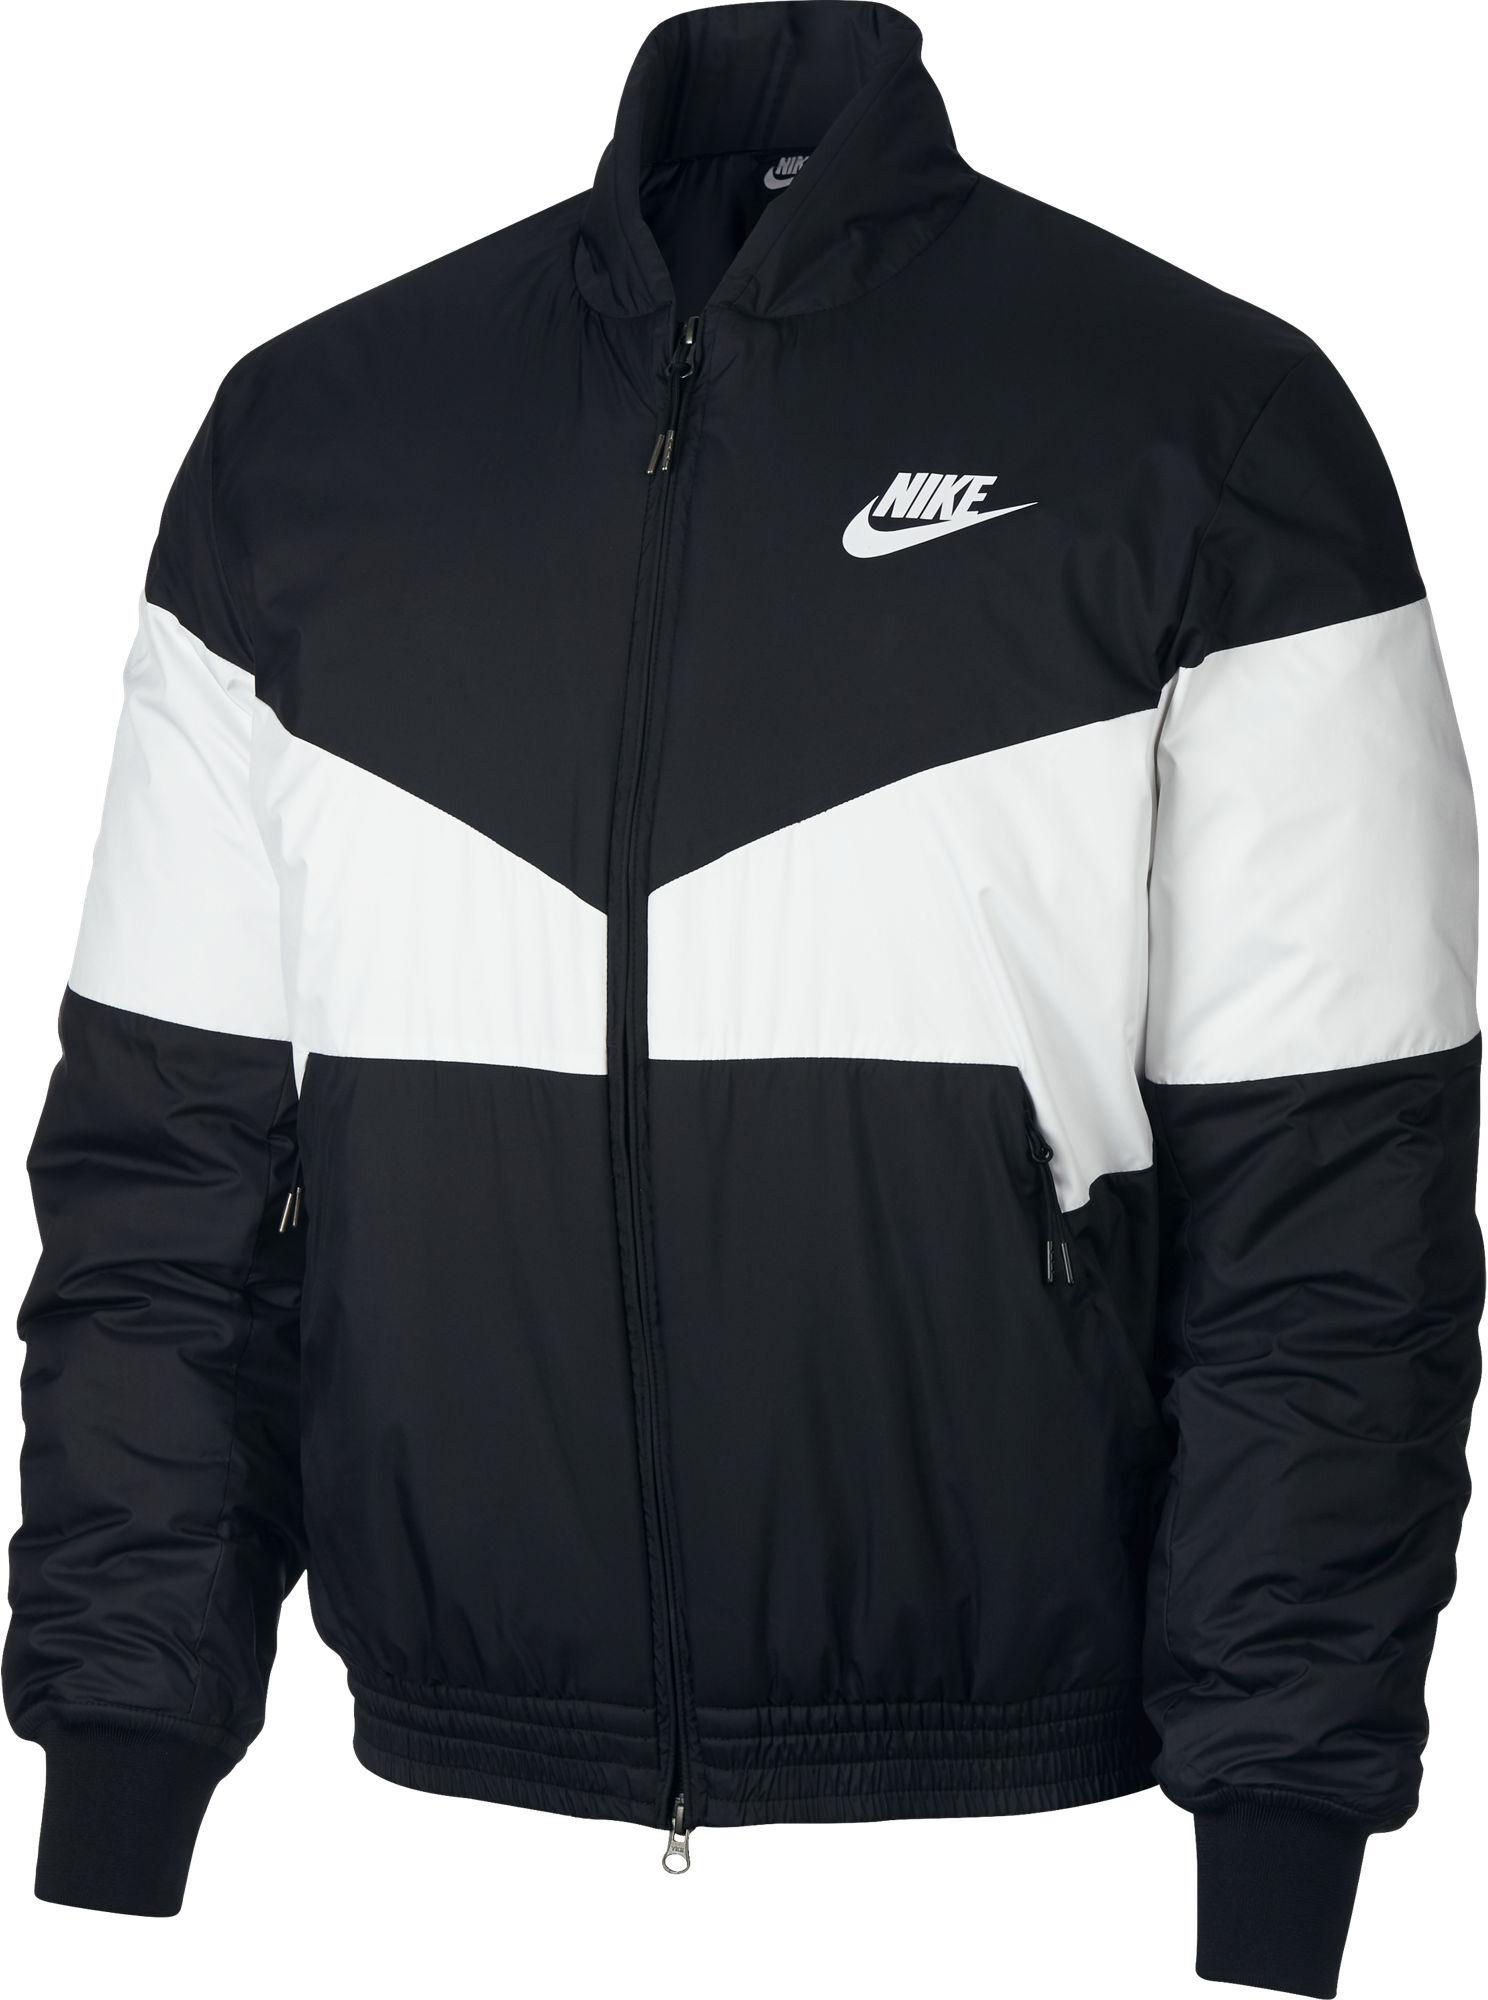 Nike INTERSPORT Chaquetas Hombre Hombre Nike Chaquetas BqvxzSYn